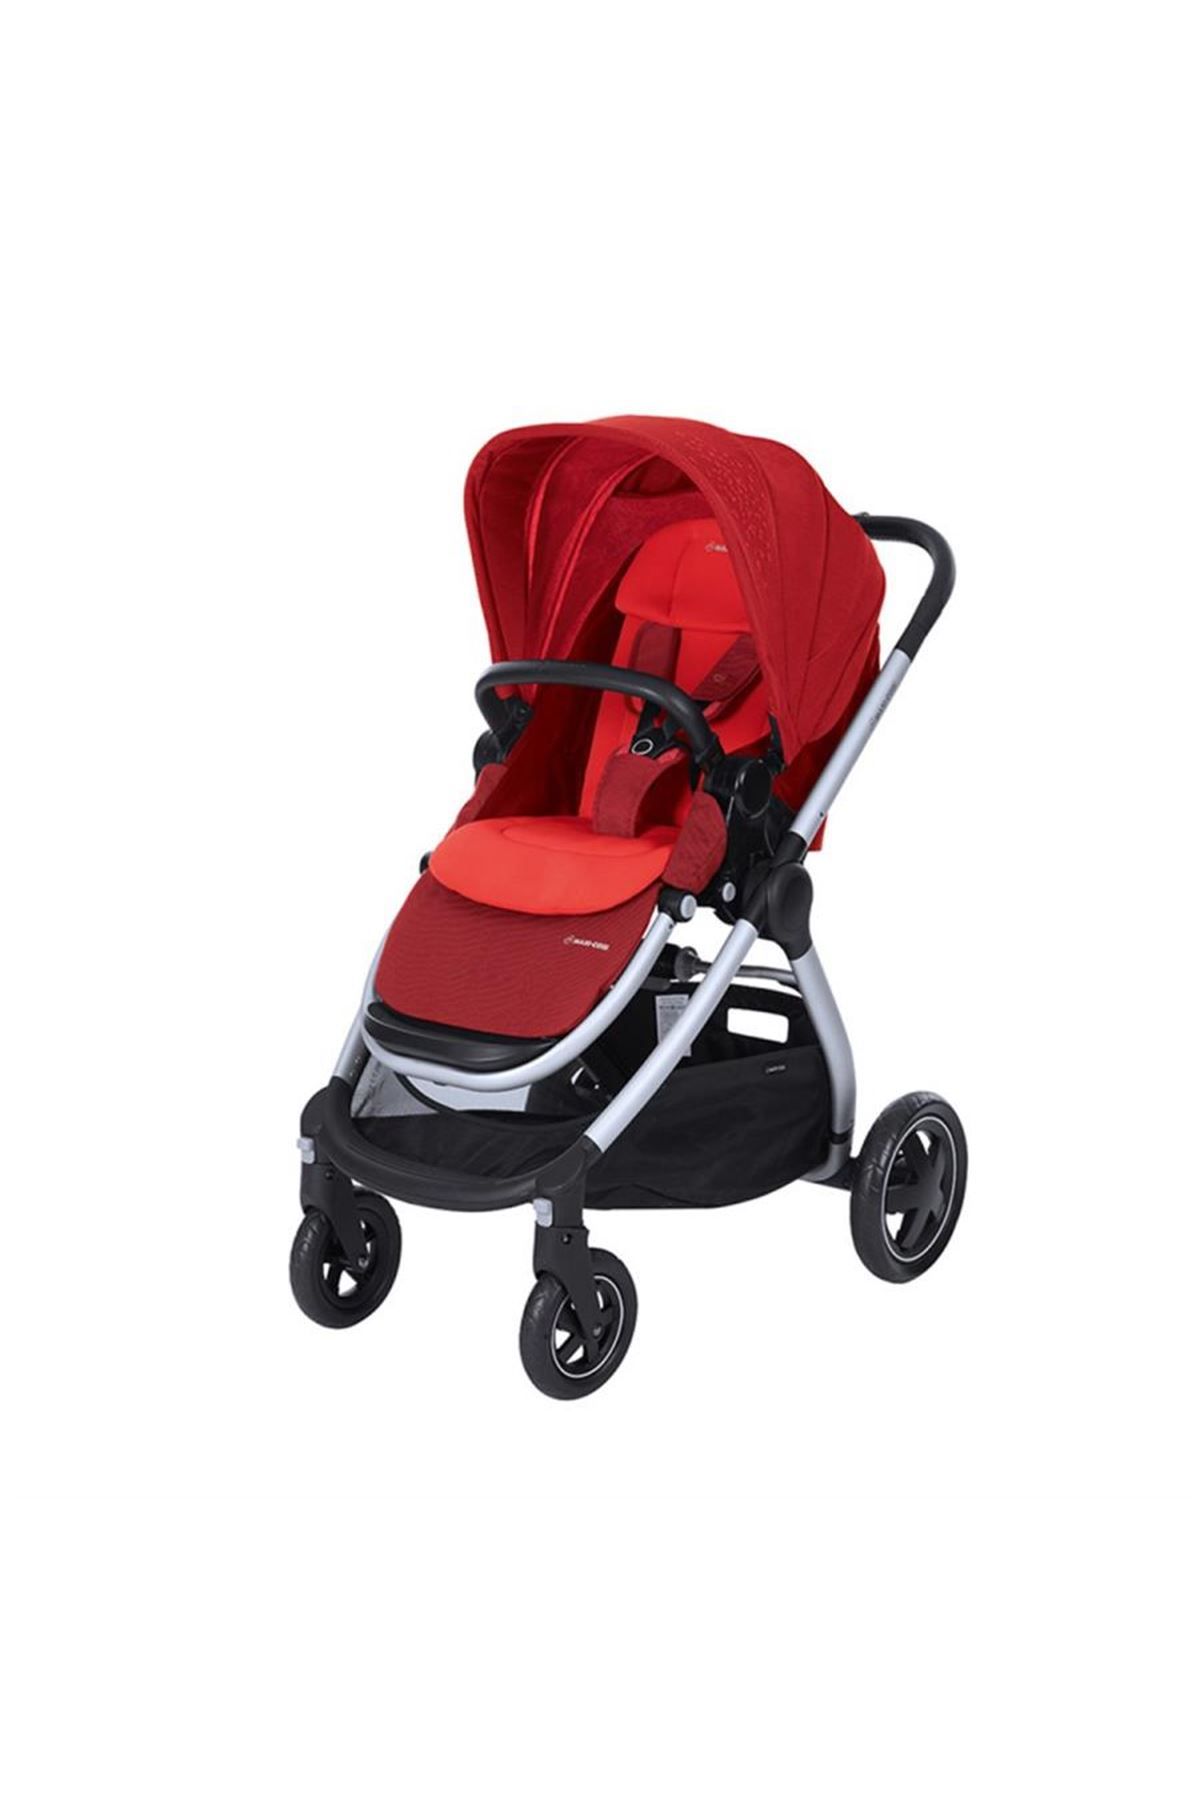 Maxi-Cosi Adorra Bebek Arabası / Vivid Red